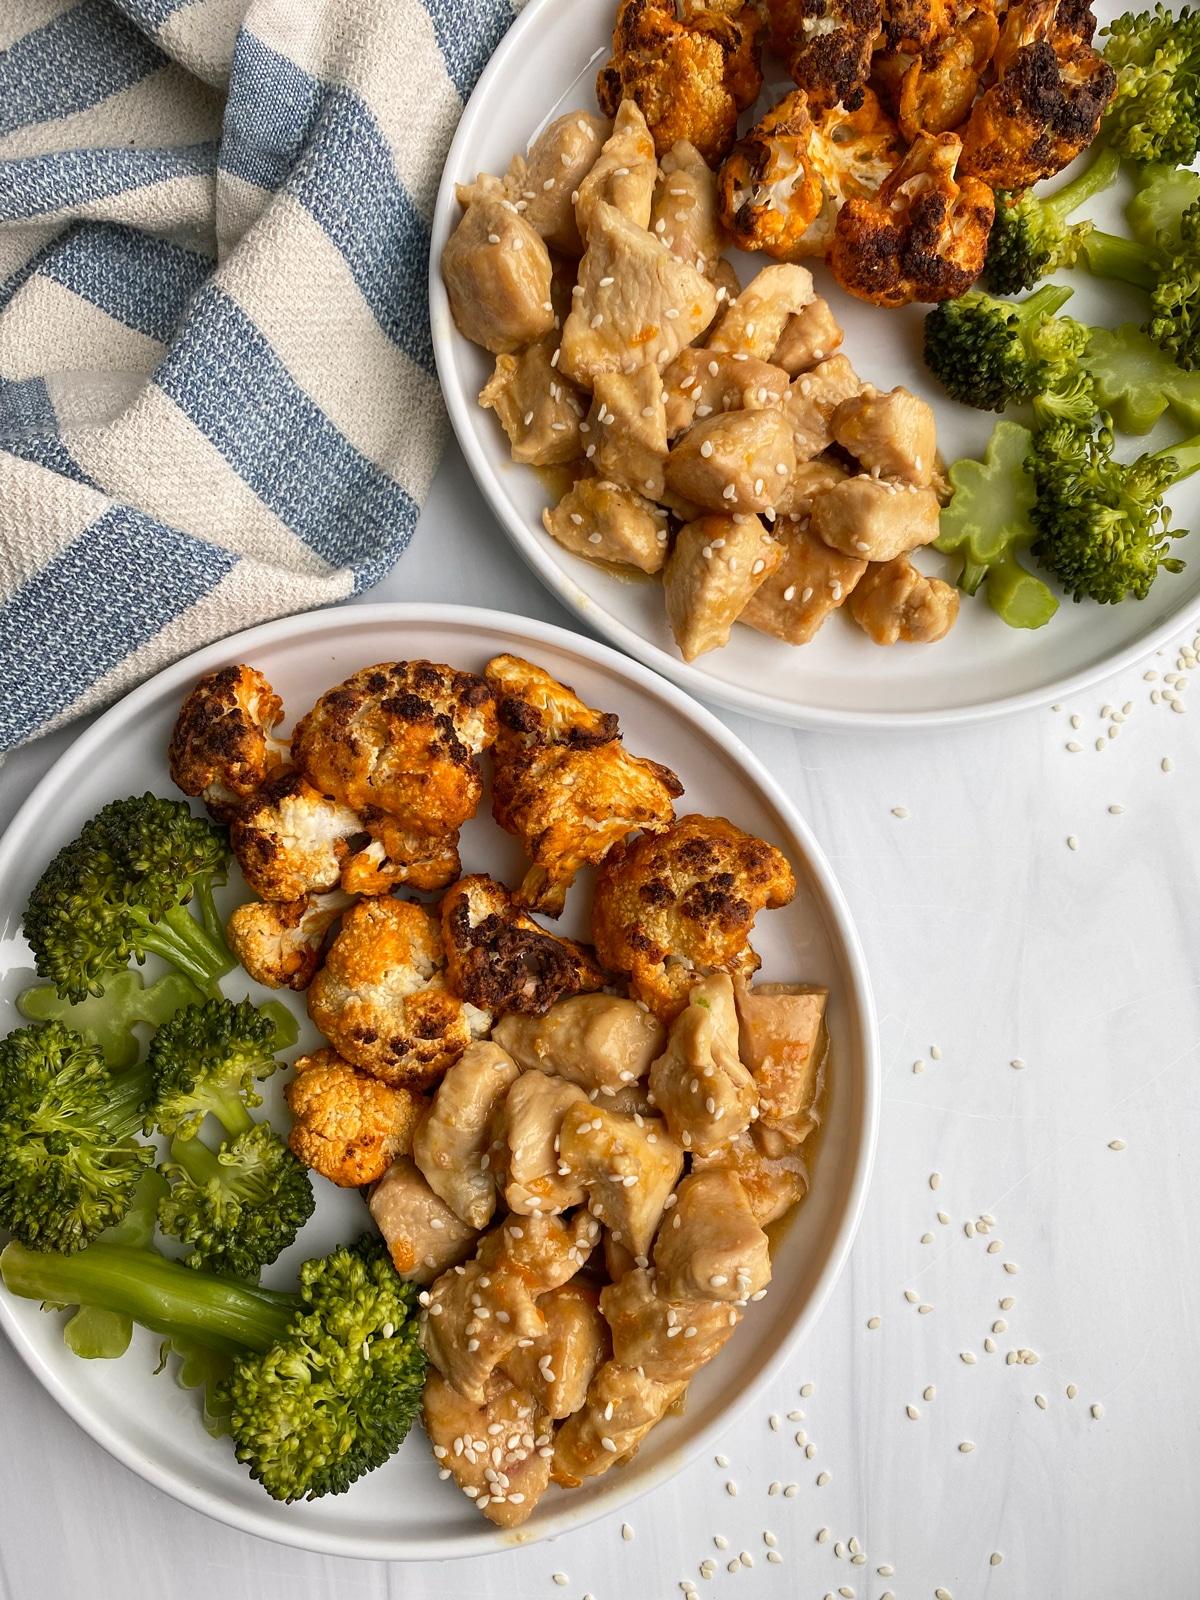 buffalo-cauliflower-with-orange-chicken-and-broccoli